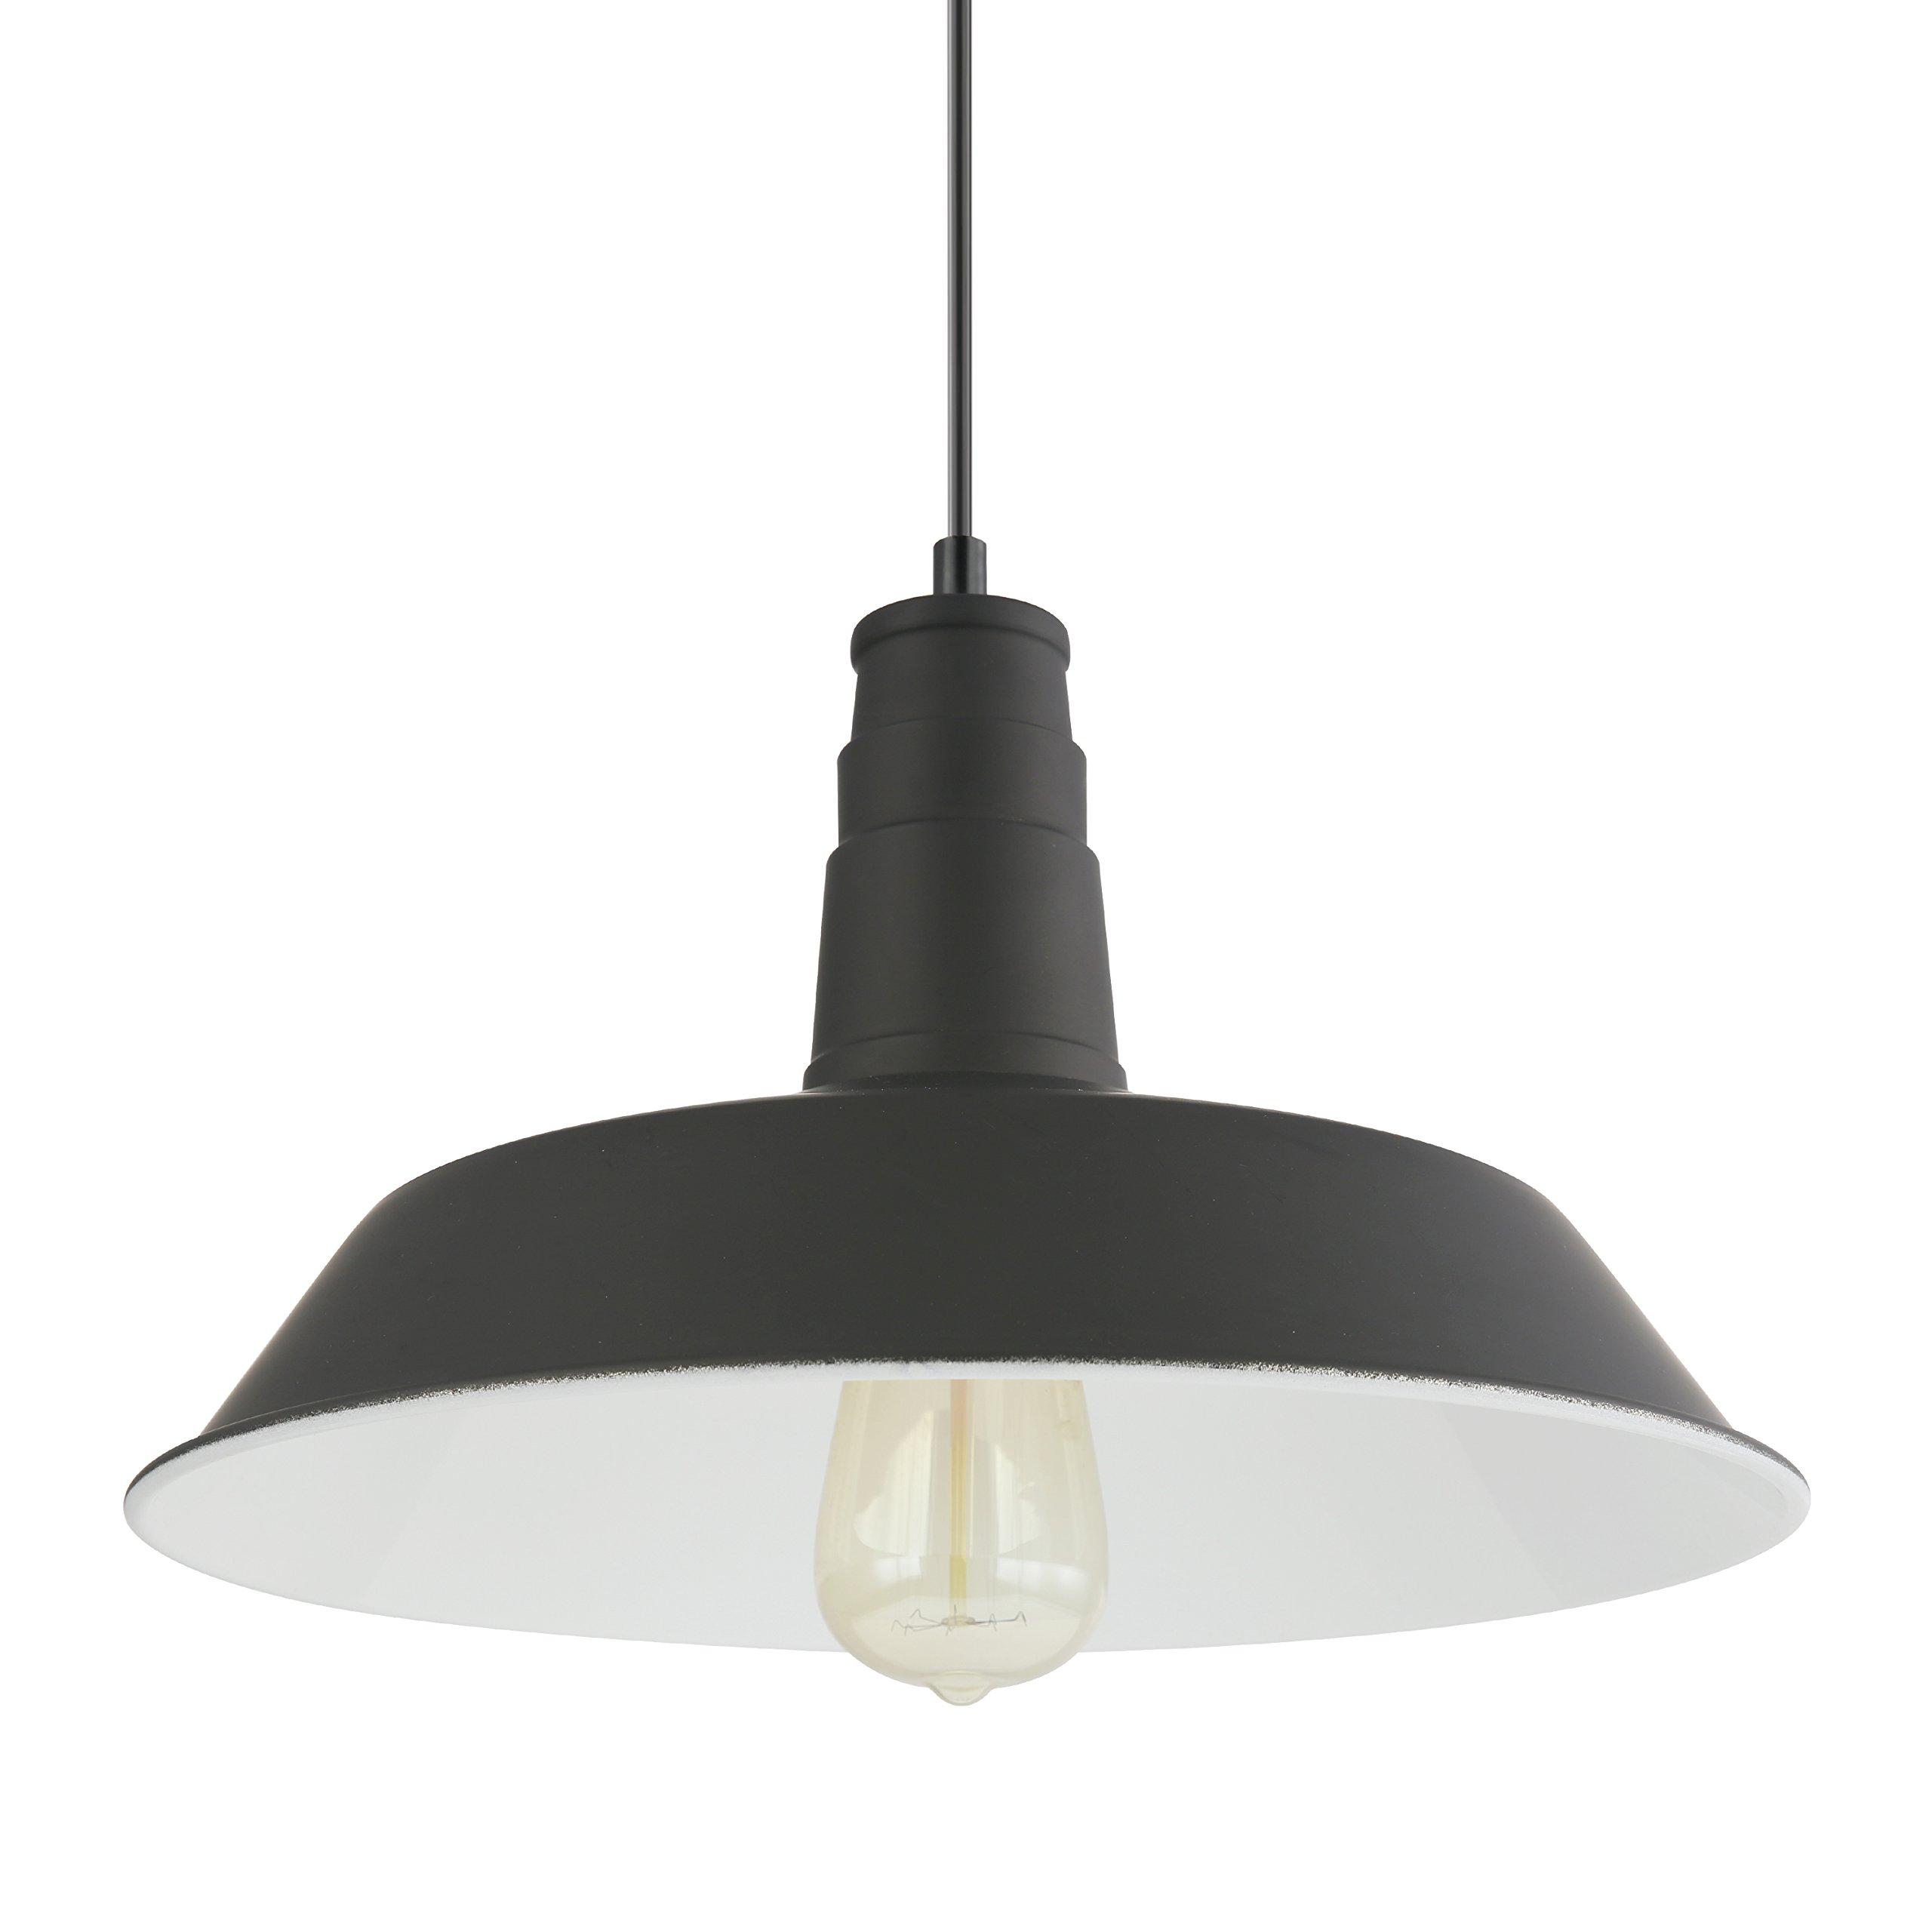 Light Society Kress Pendant Light, Matte Black Shade with White Interior, Vintage Modern Industrial Farmhouse Lighting Fixture (LS-C199-BLK) by Light Society (Image #3)